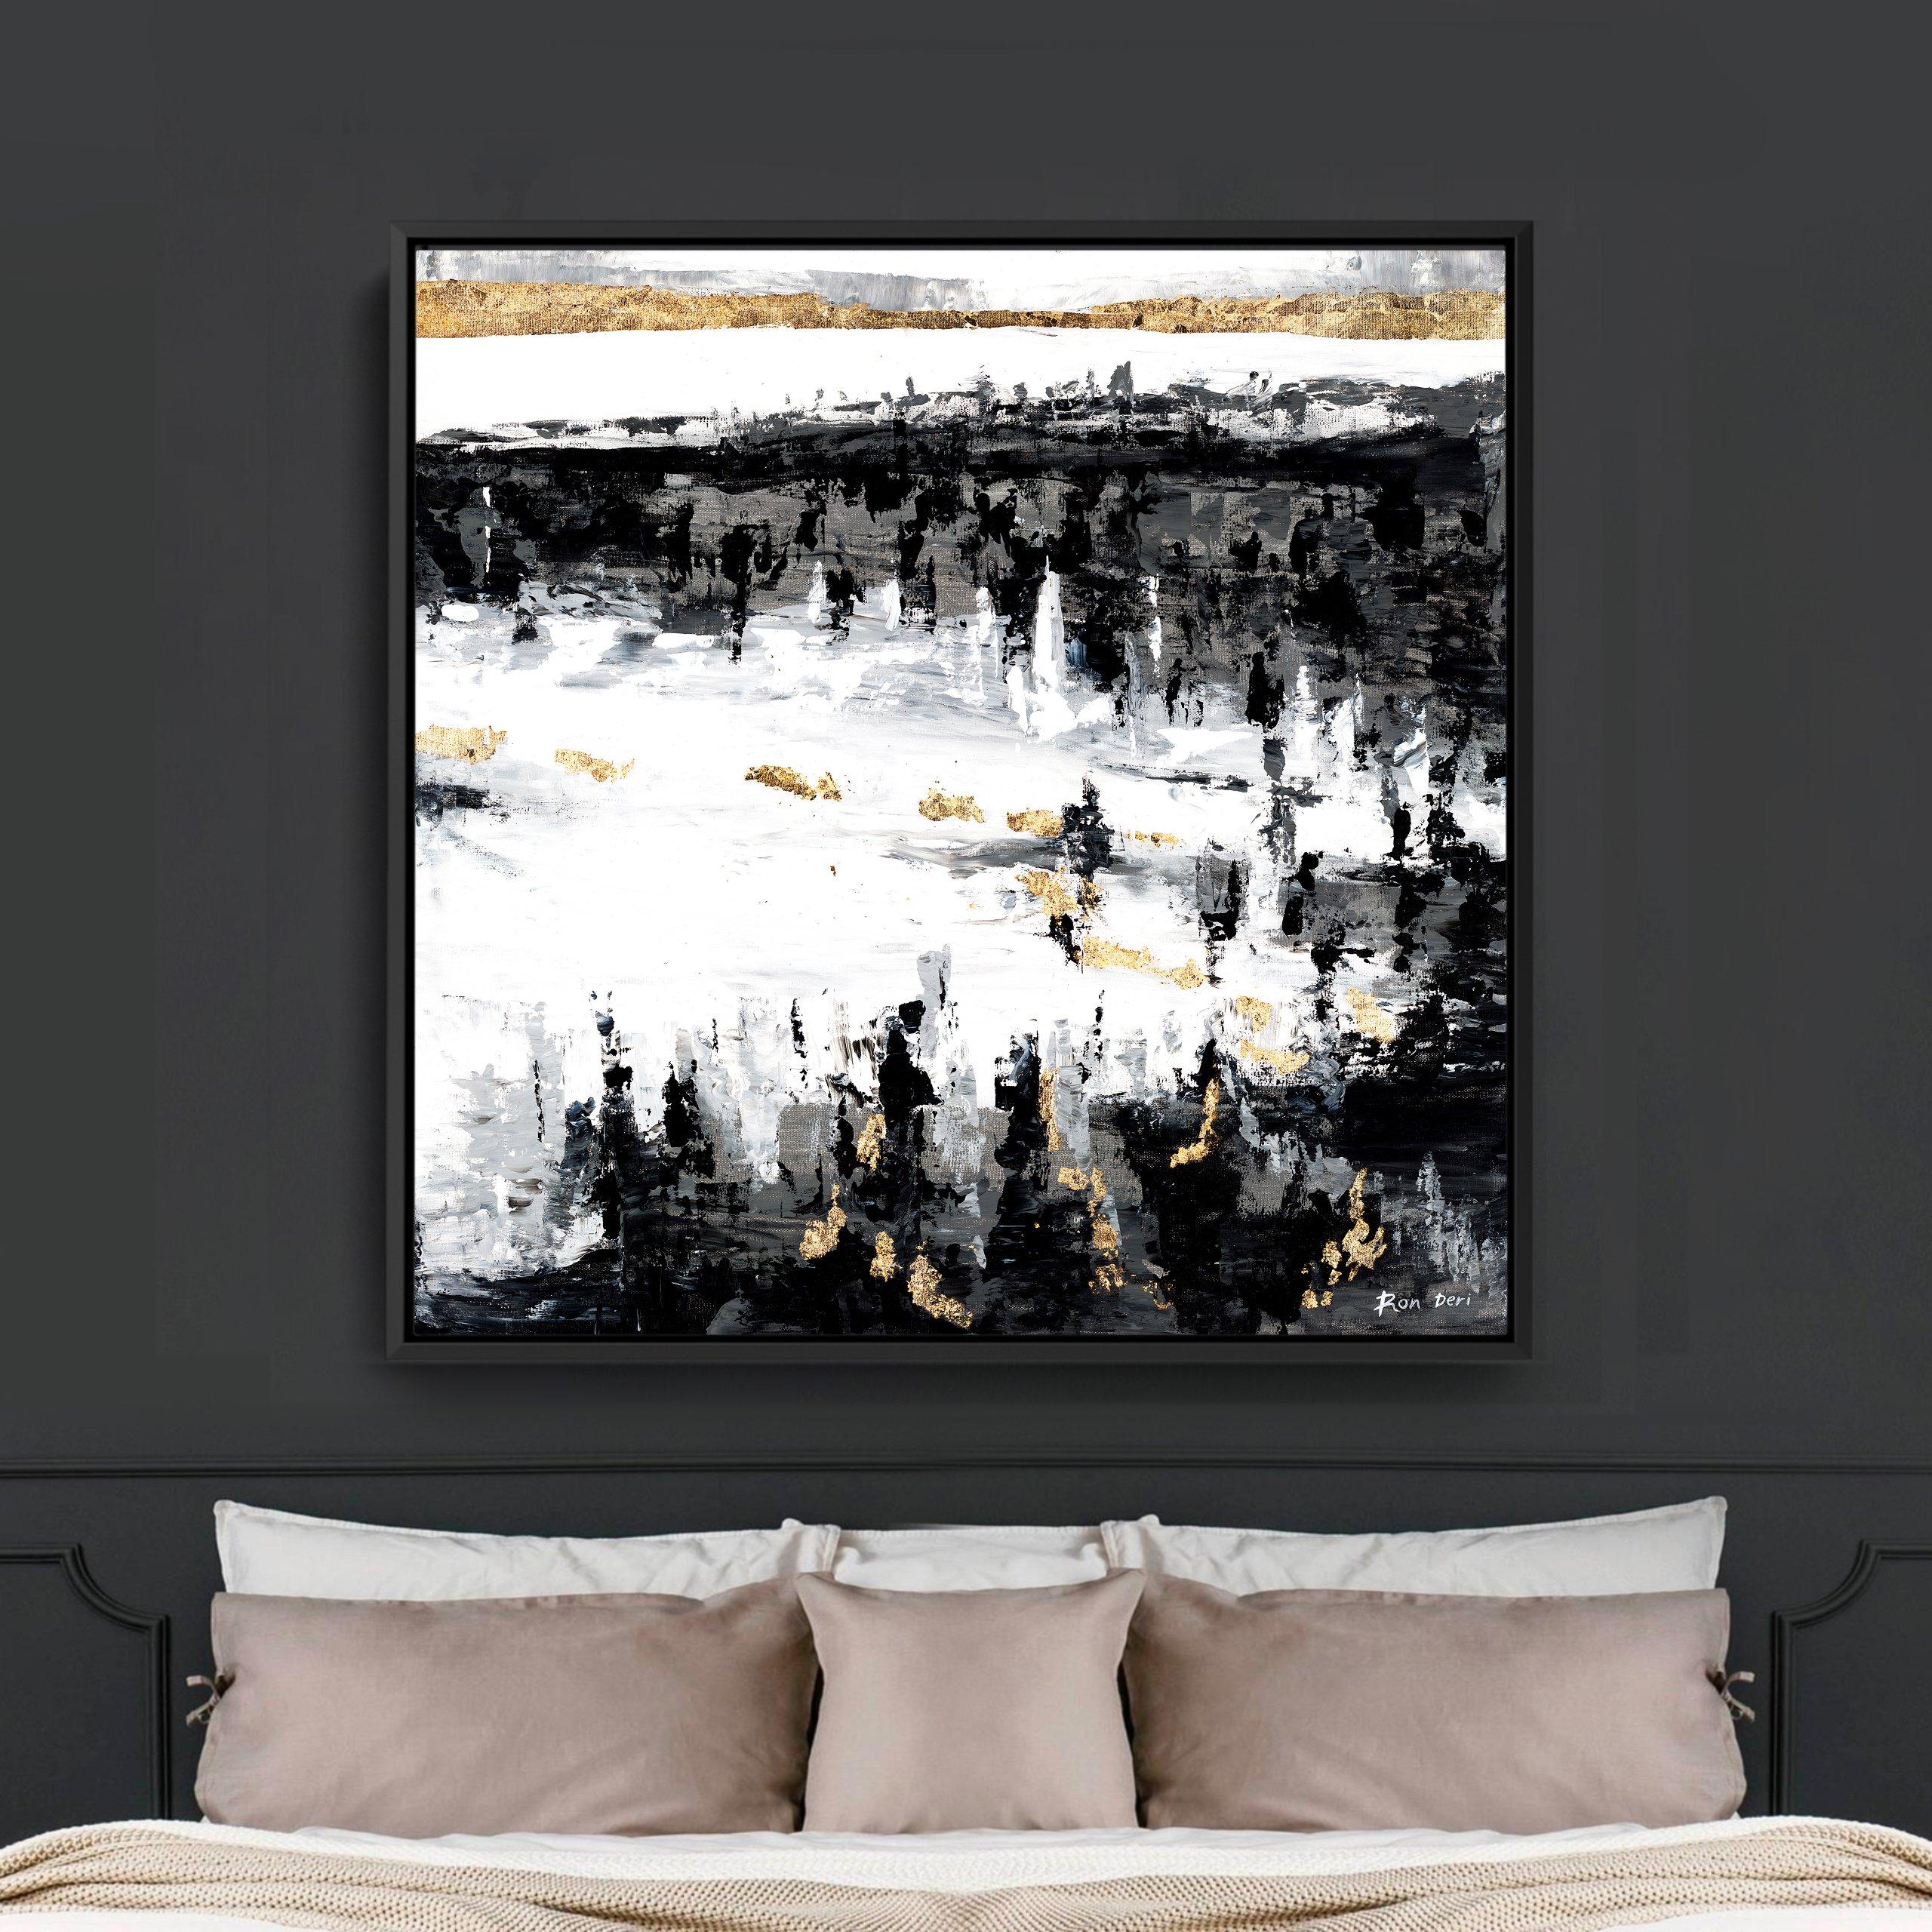 frozen-lake-ron-deri-modern-abstract-canvas